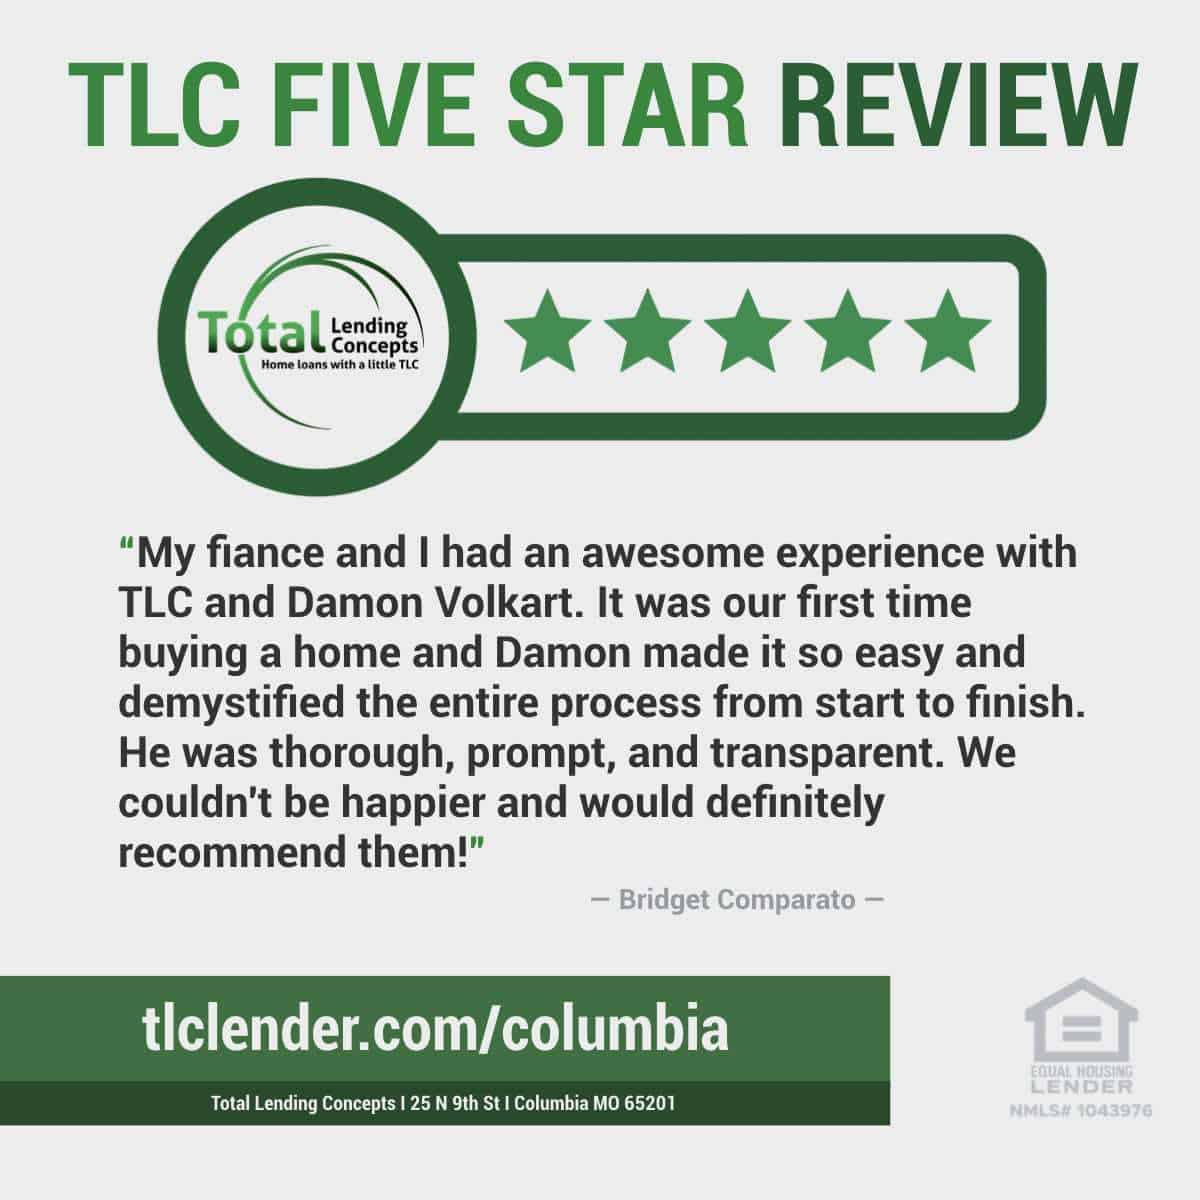 Total Lending Concepts Five Star Review Bridget Comparato in Columbia Missouri for Damon Volkart Home Loan